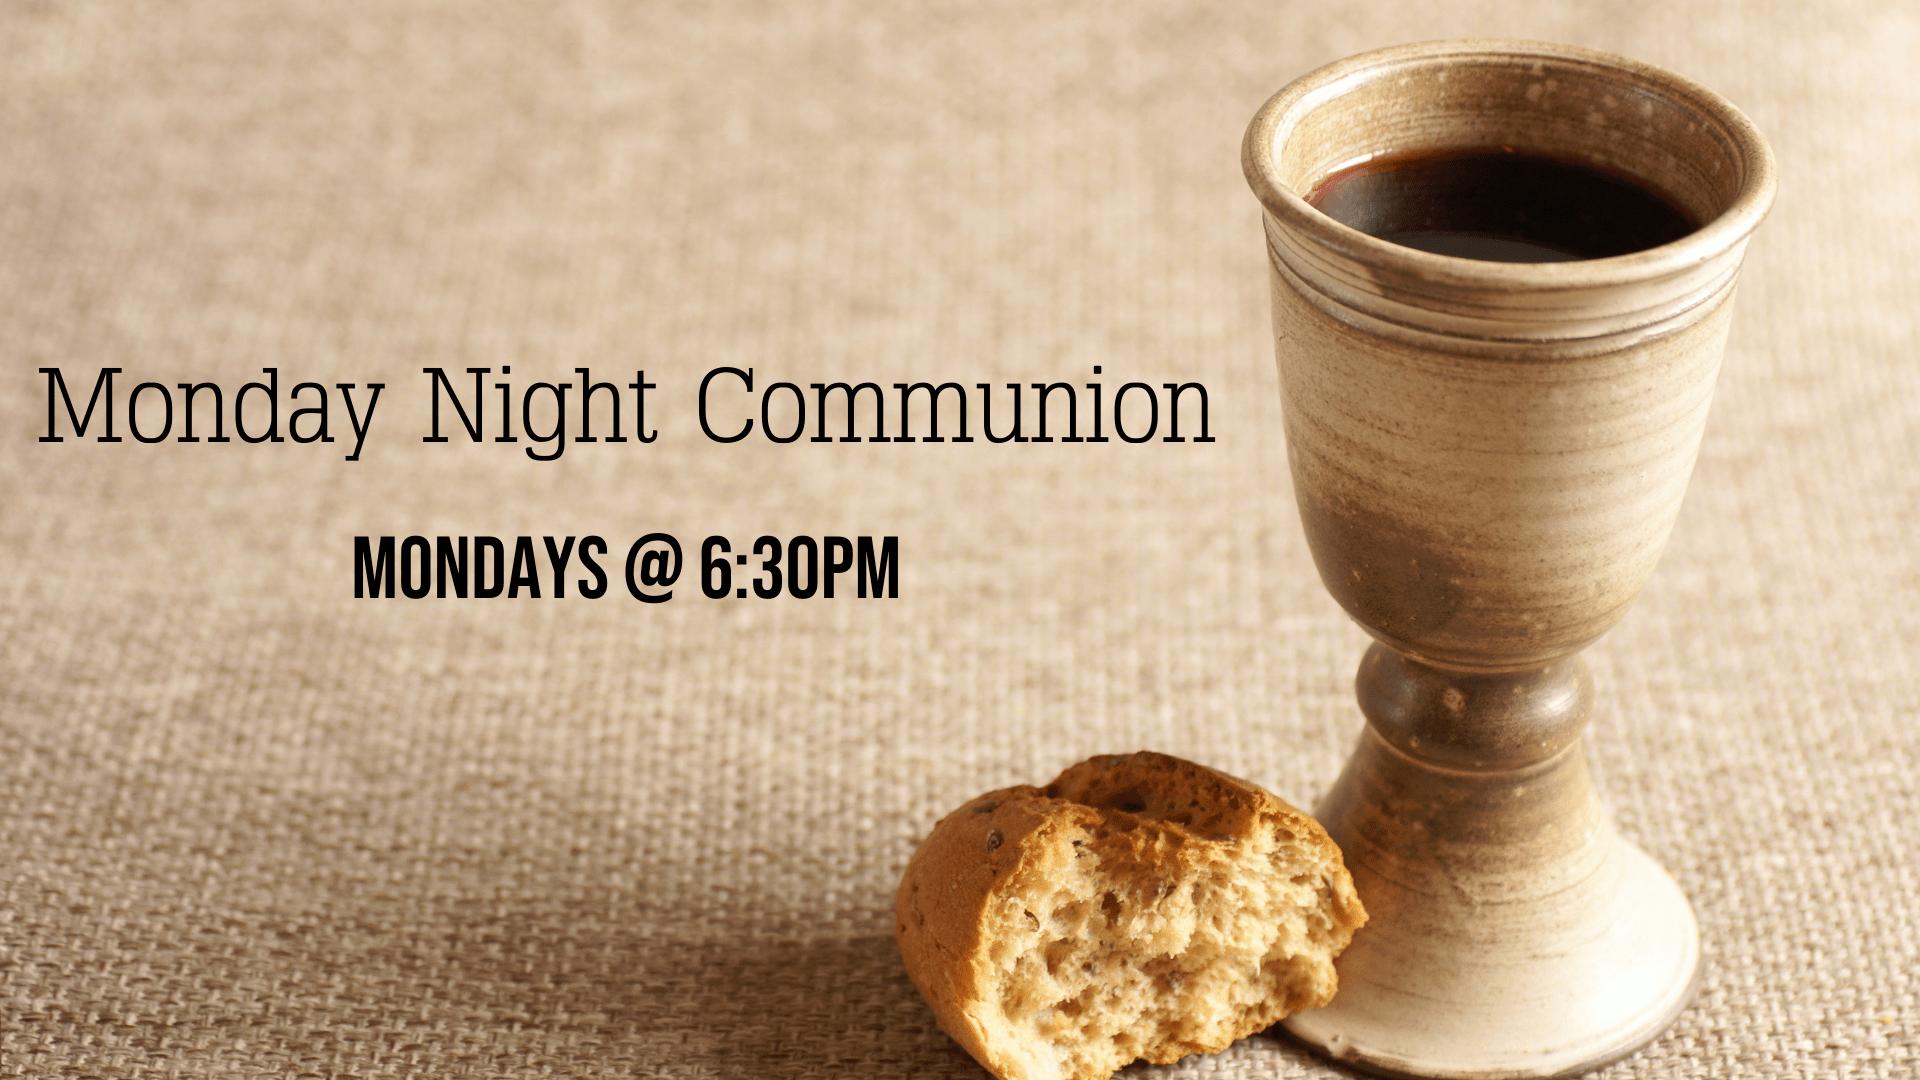 Monday Night Communion